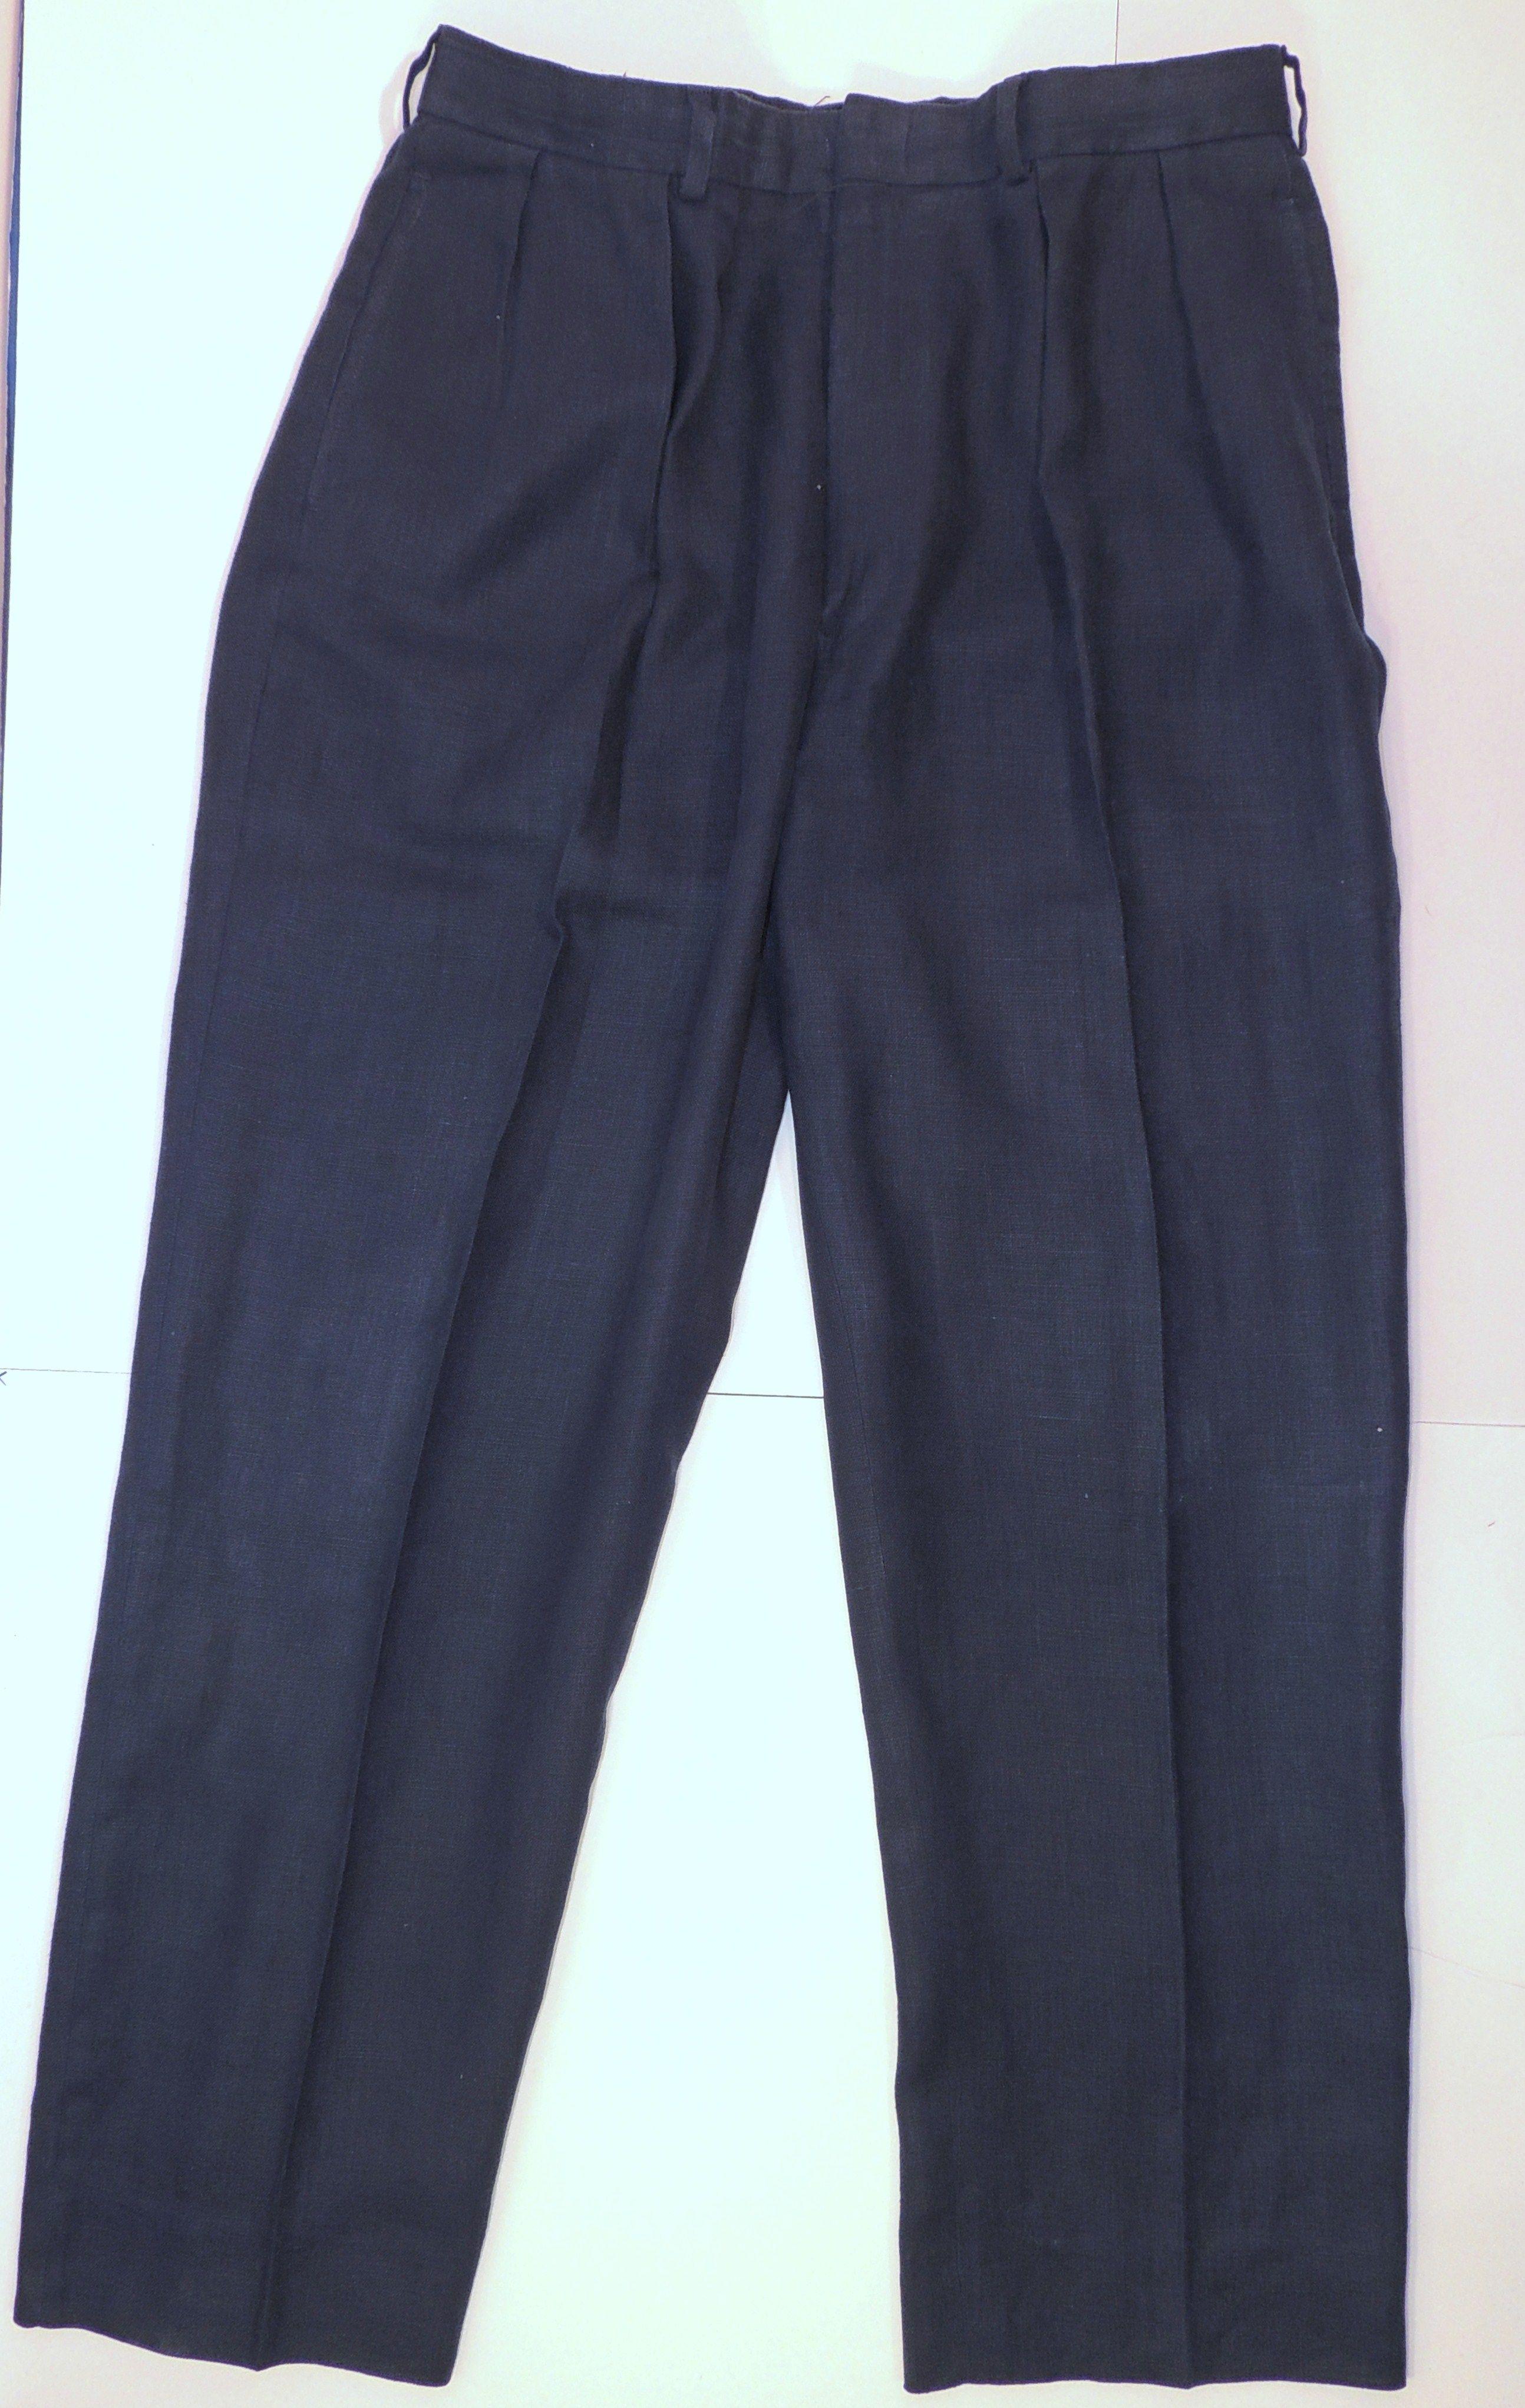 Polo Ralph Lauren Navy Blue Linen Dress Inseam 32 Pants Sz 3  http://www.ebay.com/itm/Mens-Polo-Ralph-Lauren-Navy-Blue-Linen-Dress-Inseam-32-Pants-Sz-34-685-/321812242158?ssPageName=STRK:MESE:IT  #polo #PRL #linen